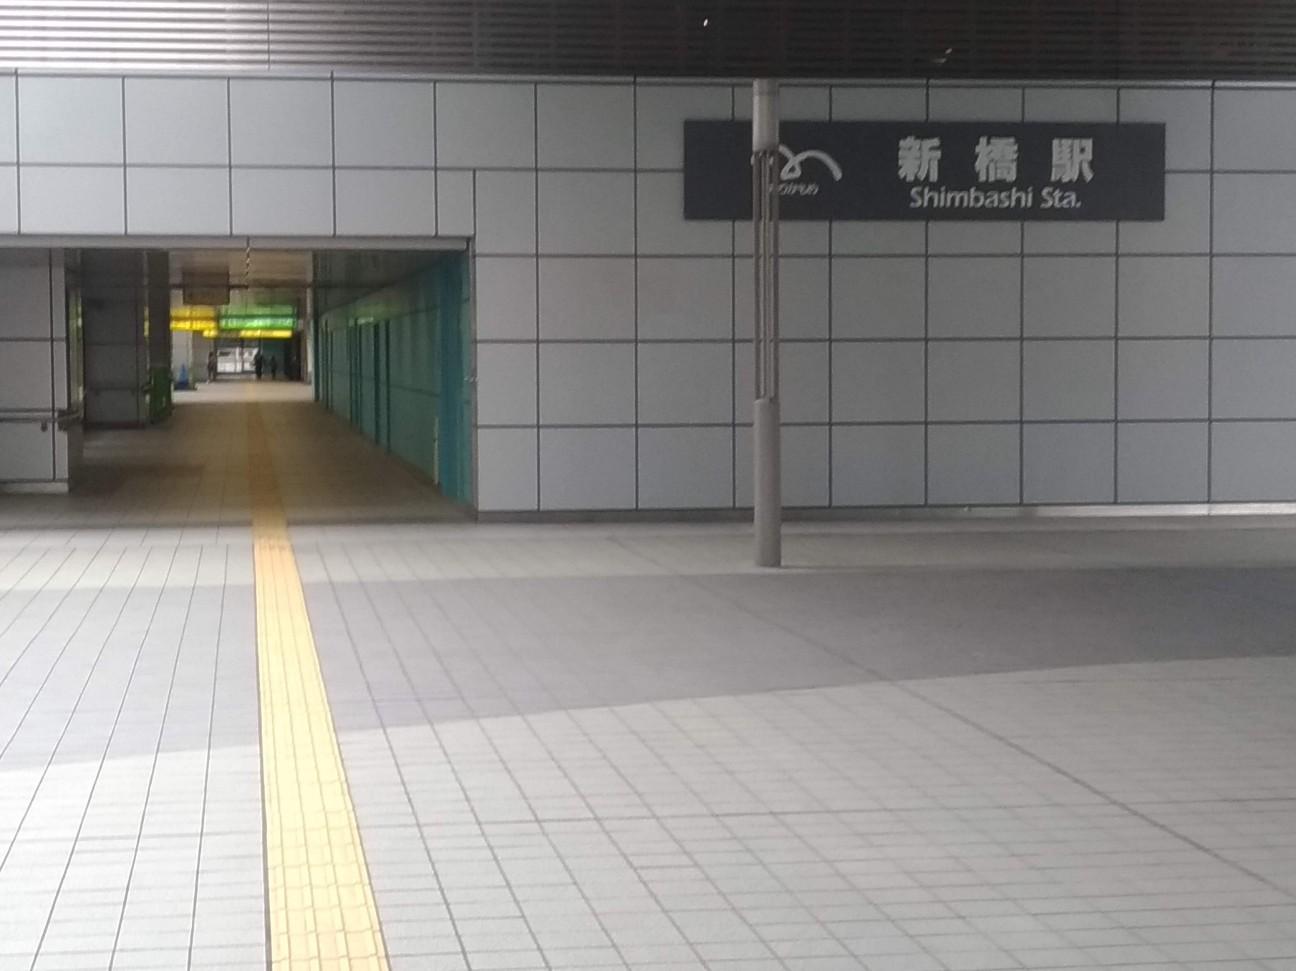 f:id:HKT1989:20200418144720j:image